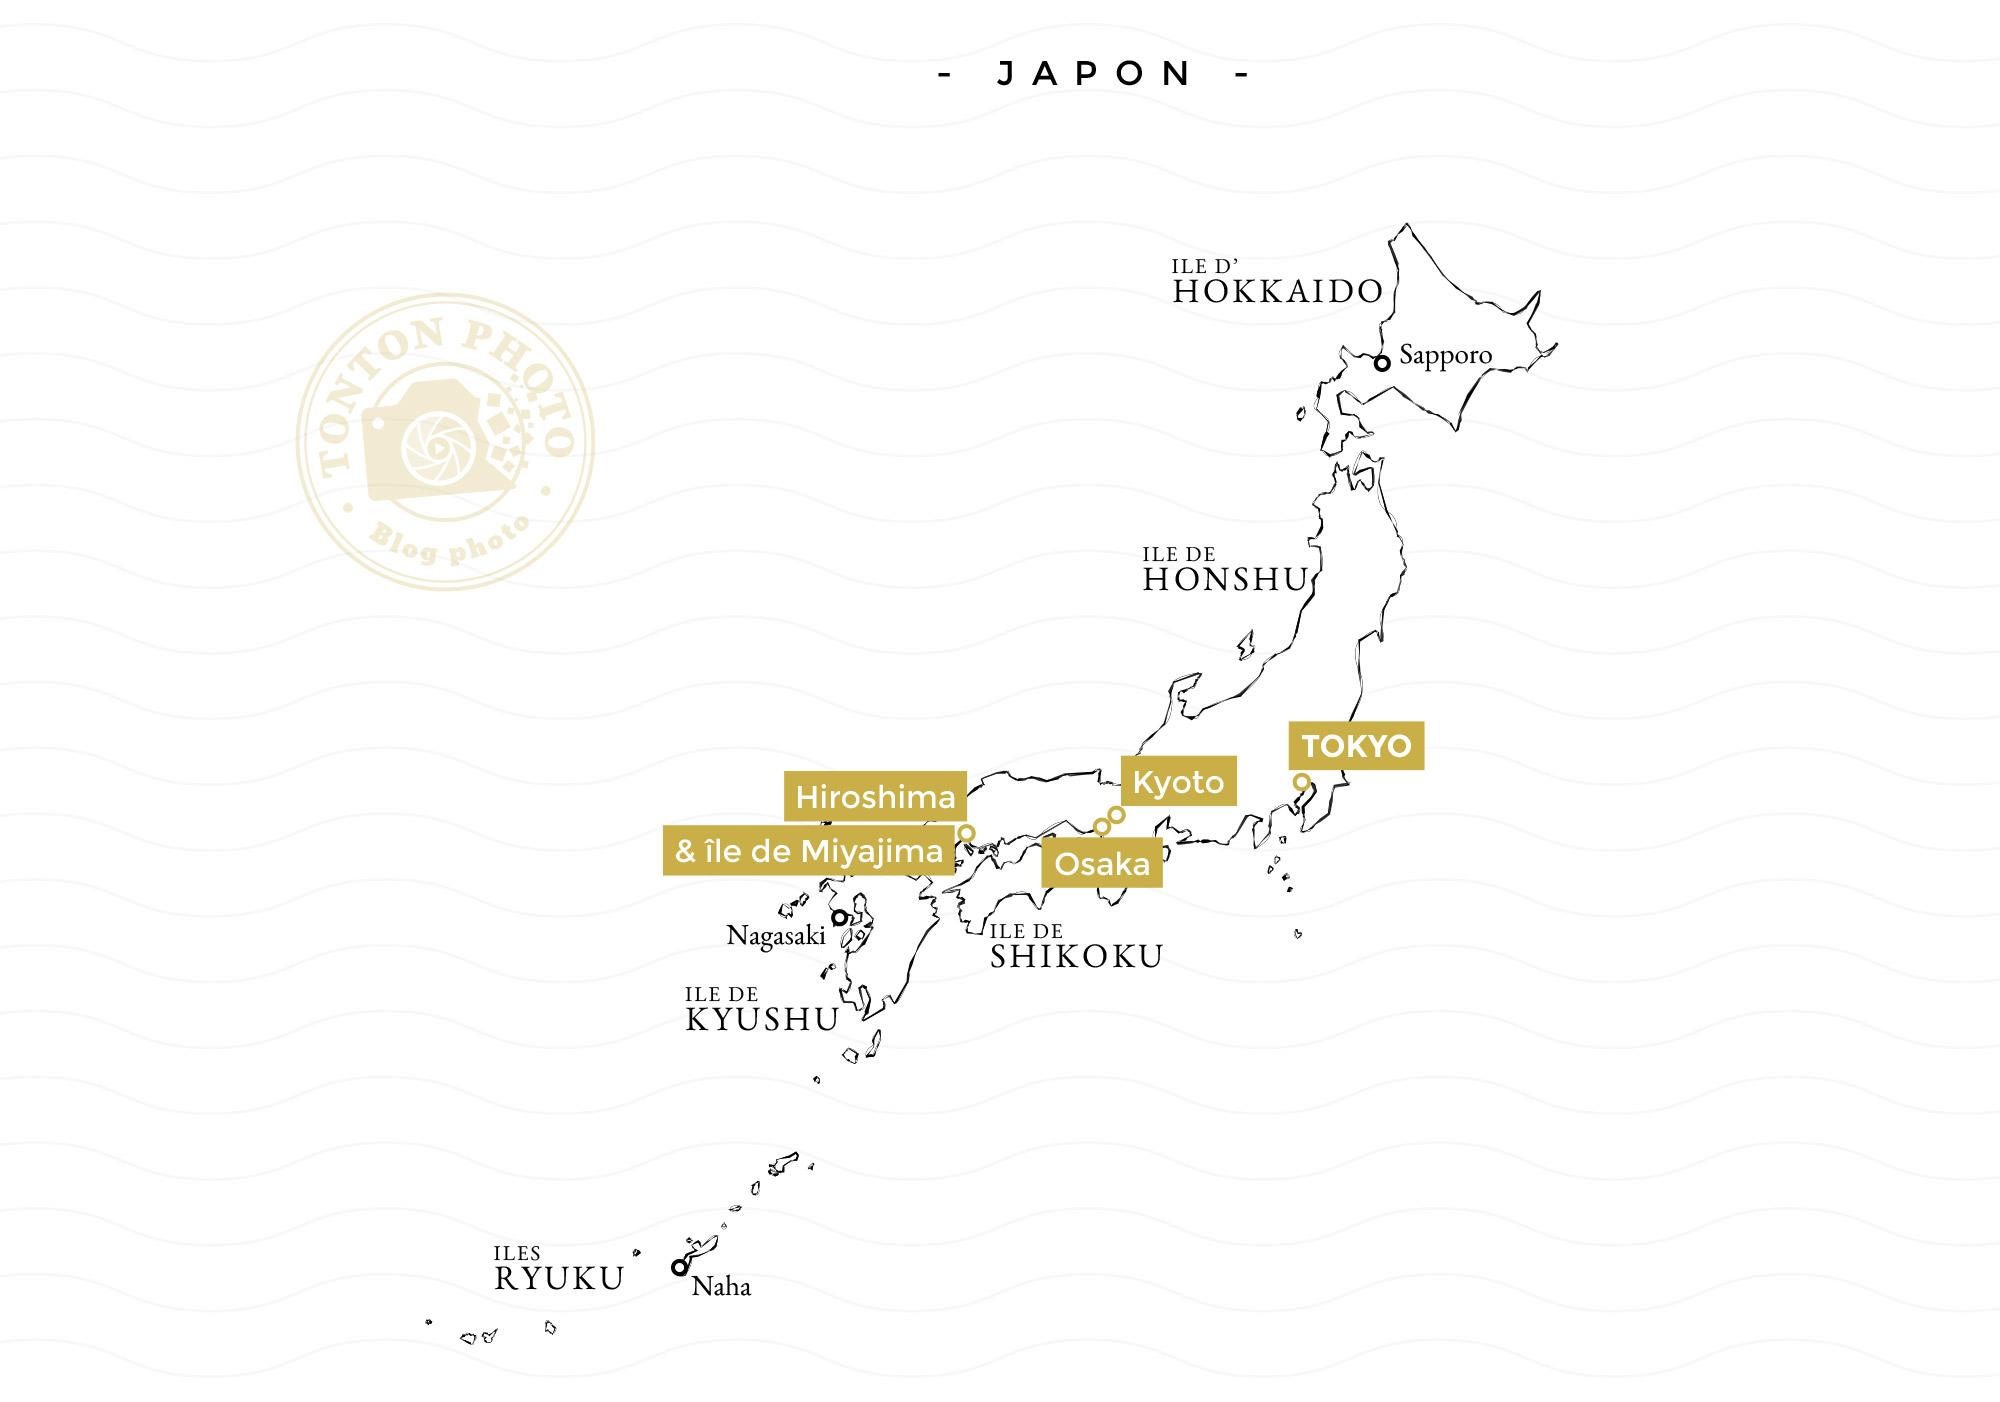 Carte des étapes du second voyage-photo au Japon : Osaka, Kyoto, Miyajima, Hiroshima et Tokyo © Tonton Photo